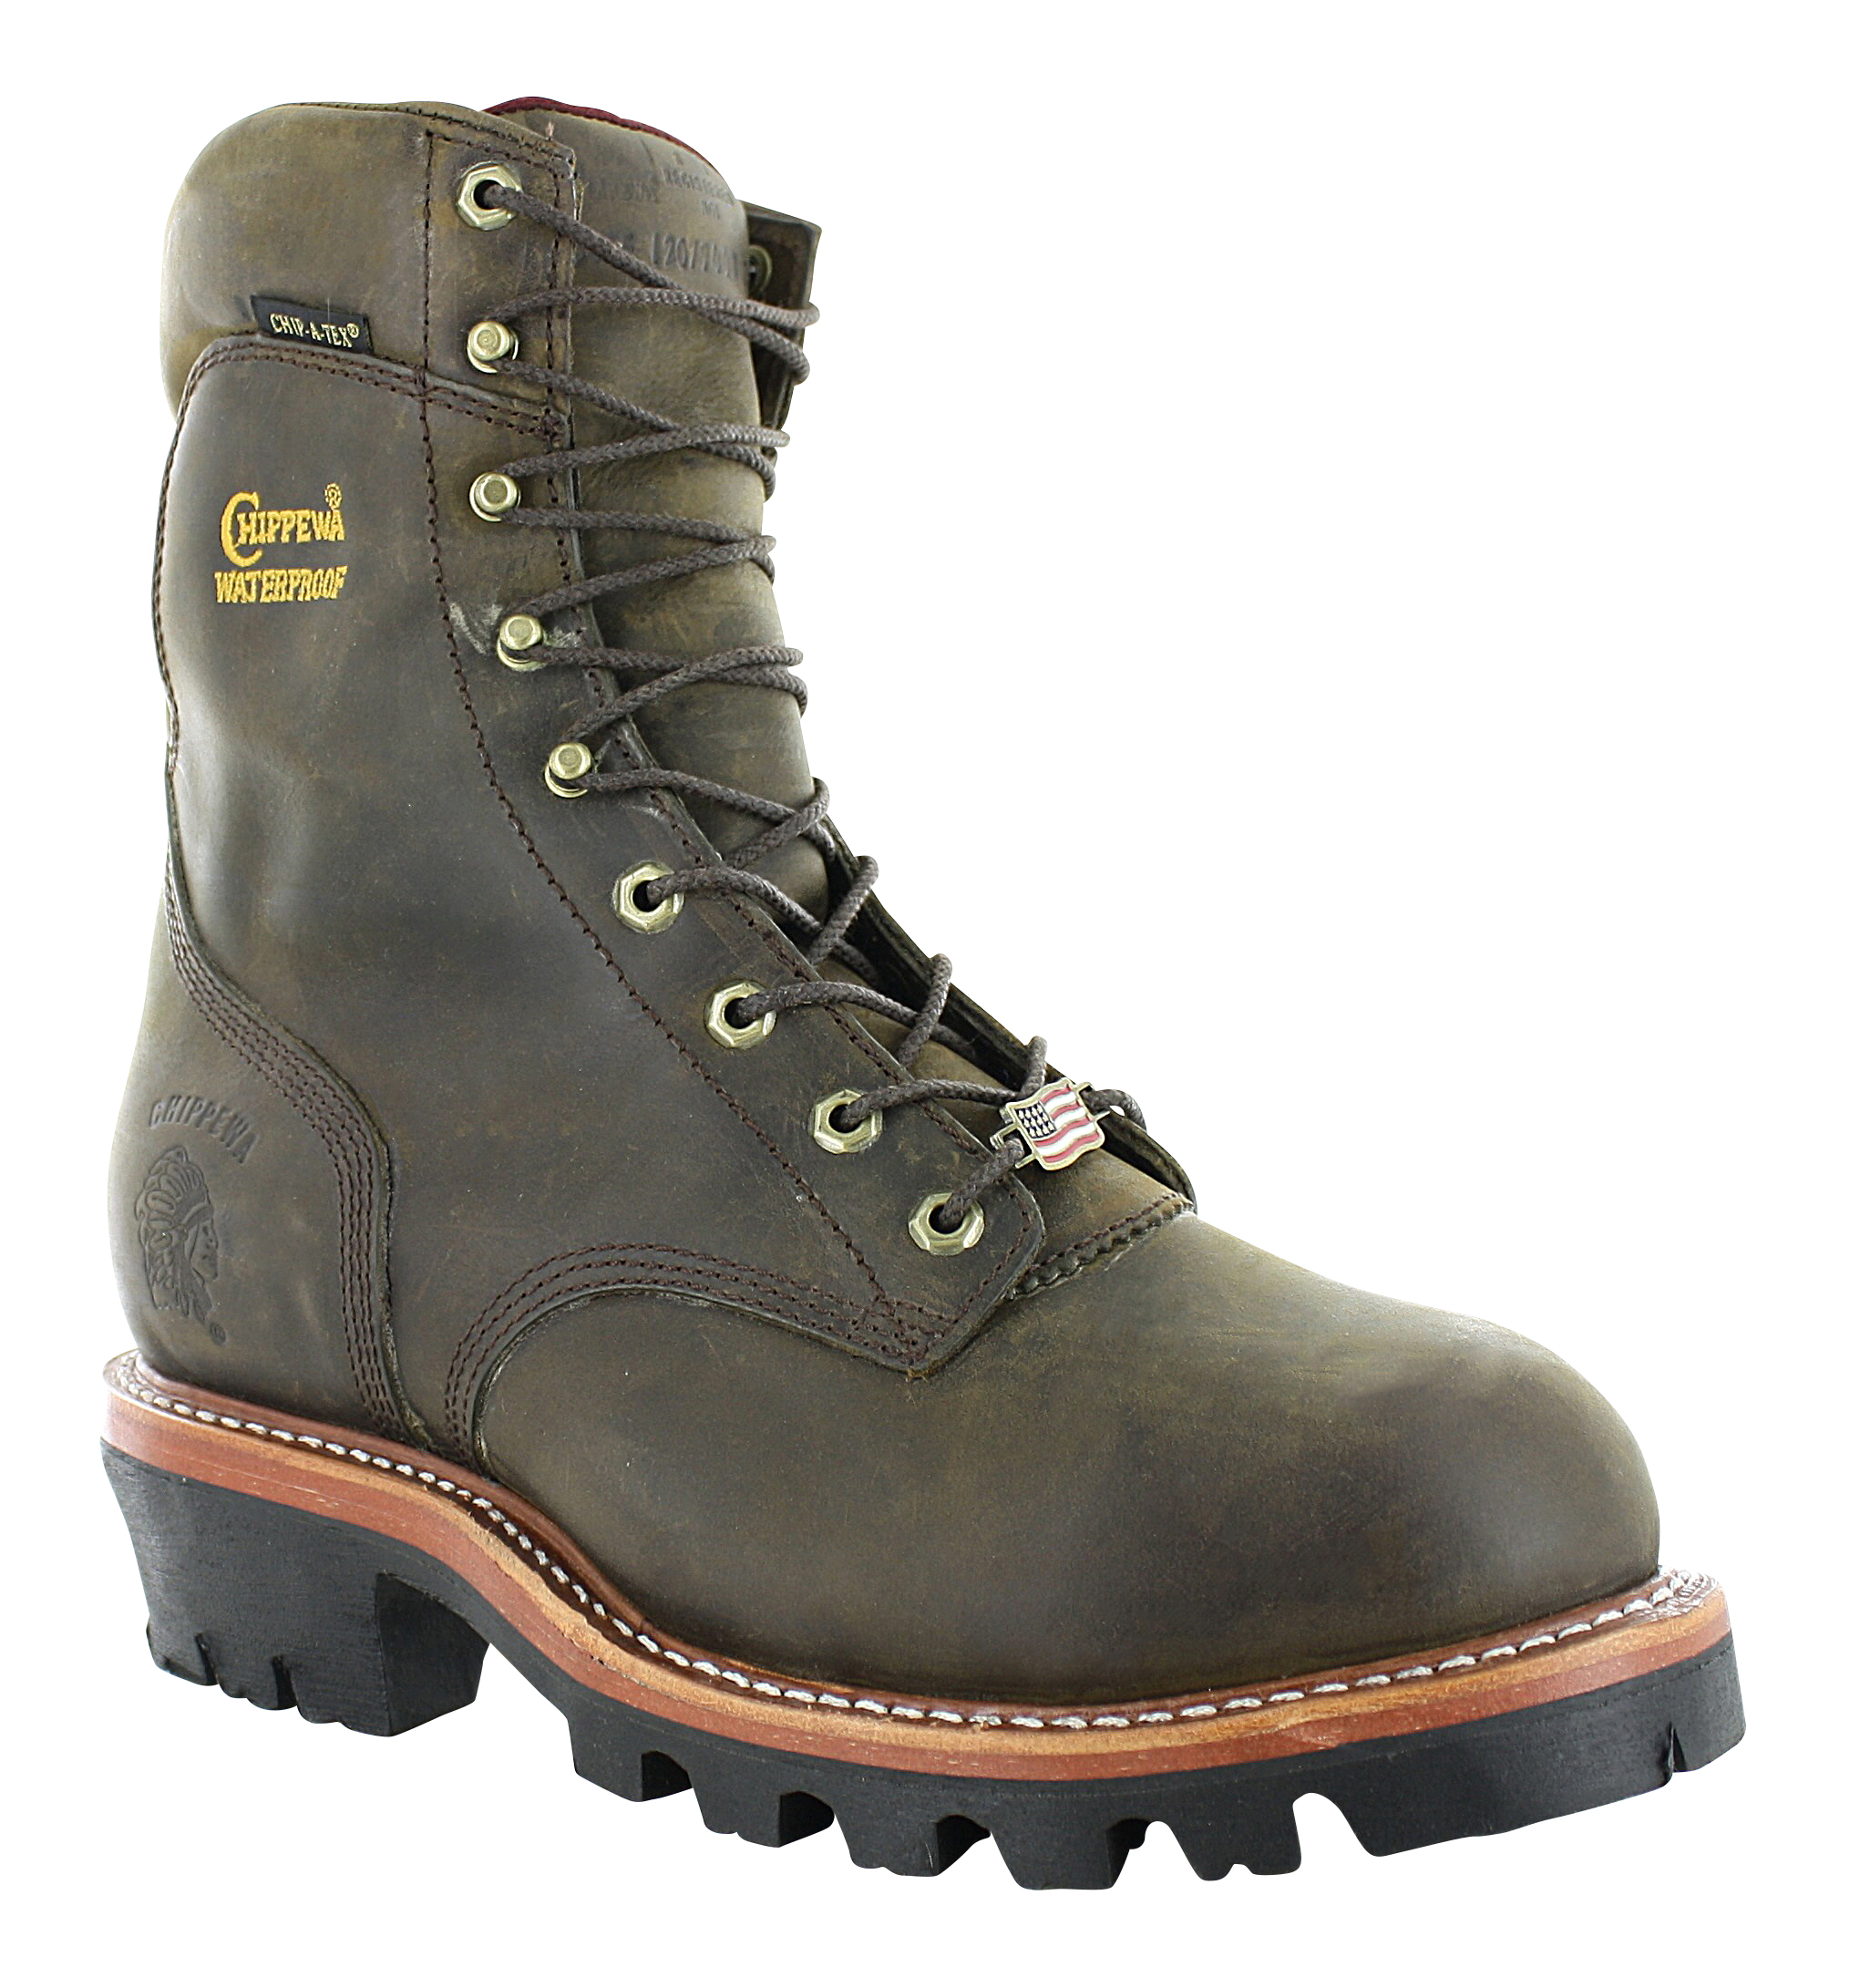 f954e2d9bae Chippewa Boots 25405 Cheap | www.nanomat-master.eu